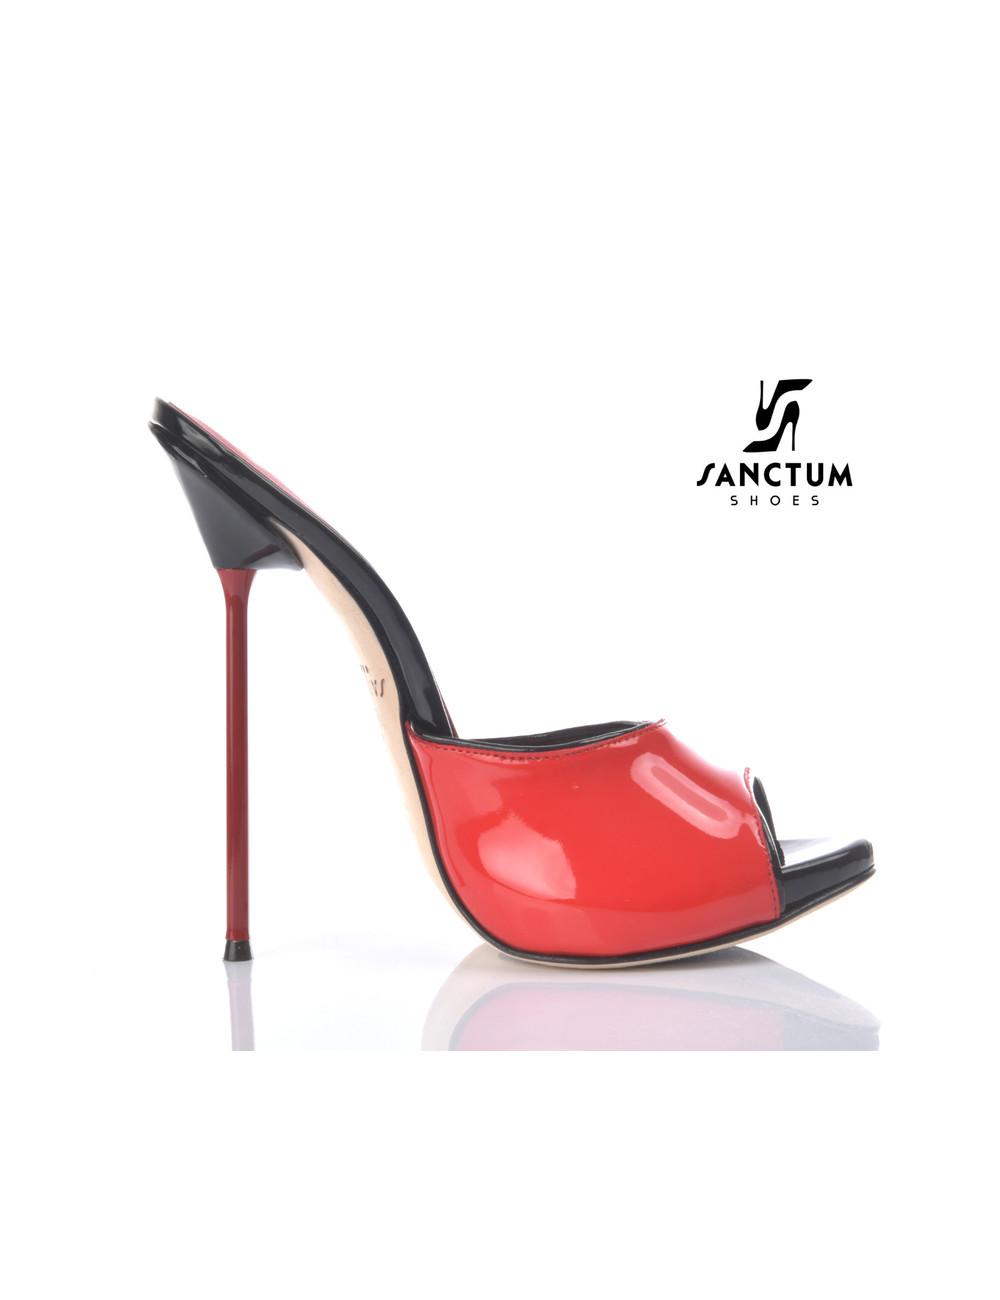 Sanctum Extrem hohe italienische Pantoletten MAIA mit Metallnadelabsatz